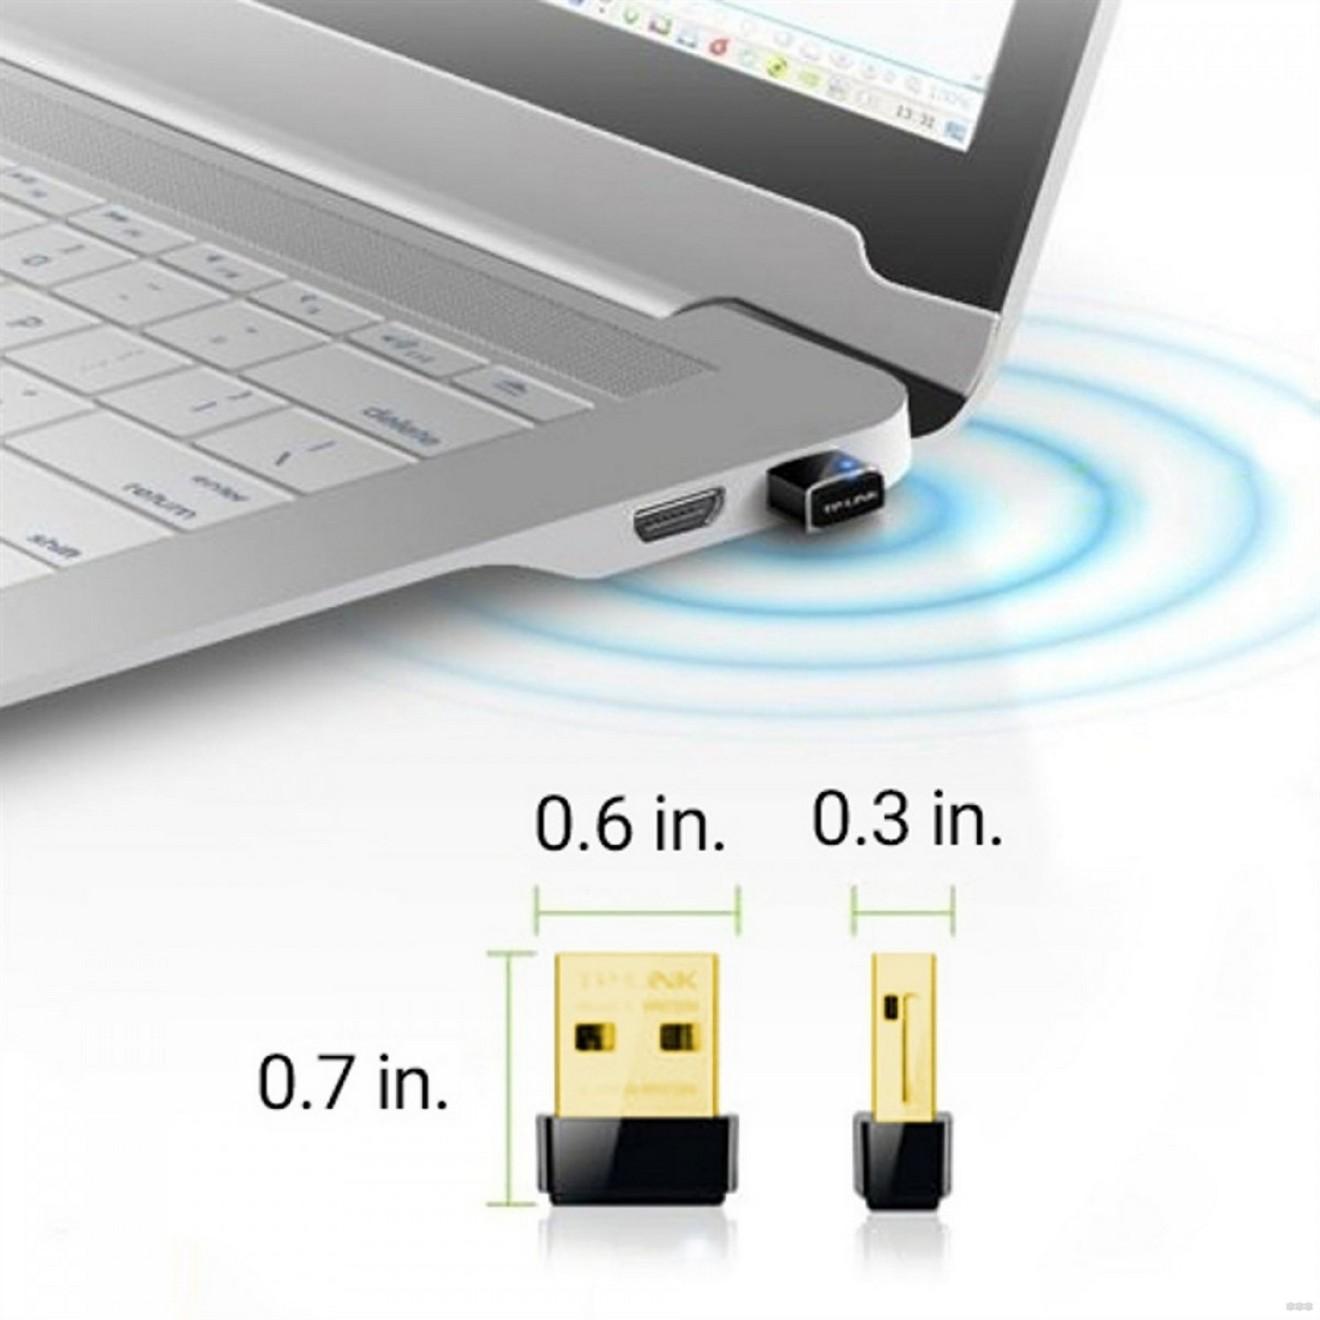 Wi-Fi адаптер TP-Link TL-WN725N Nano: обзор и настройки от WiFiGid